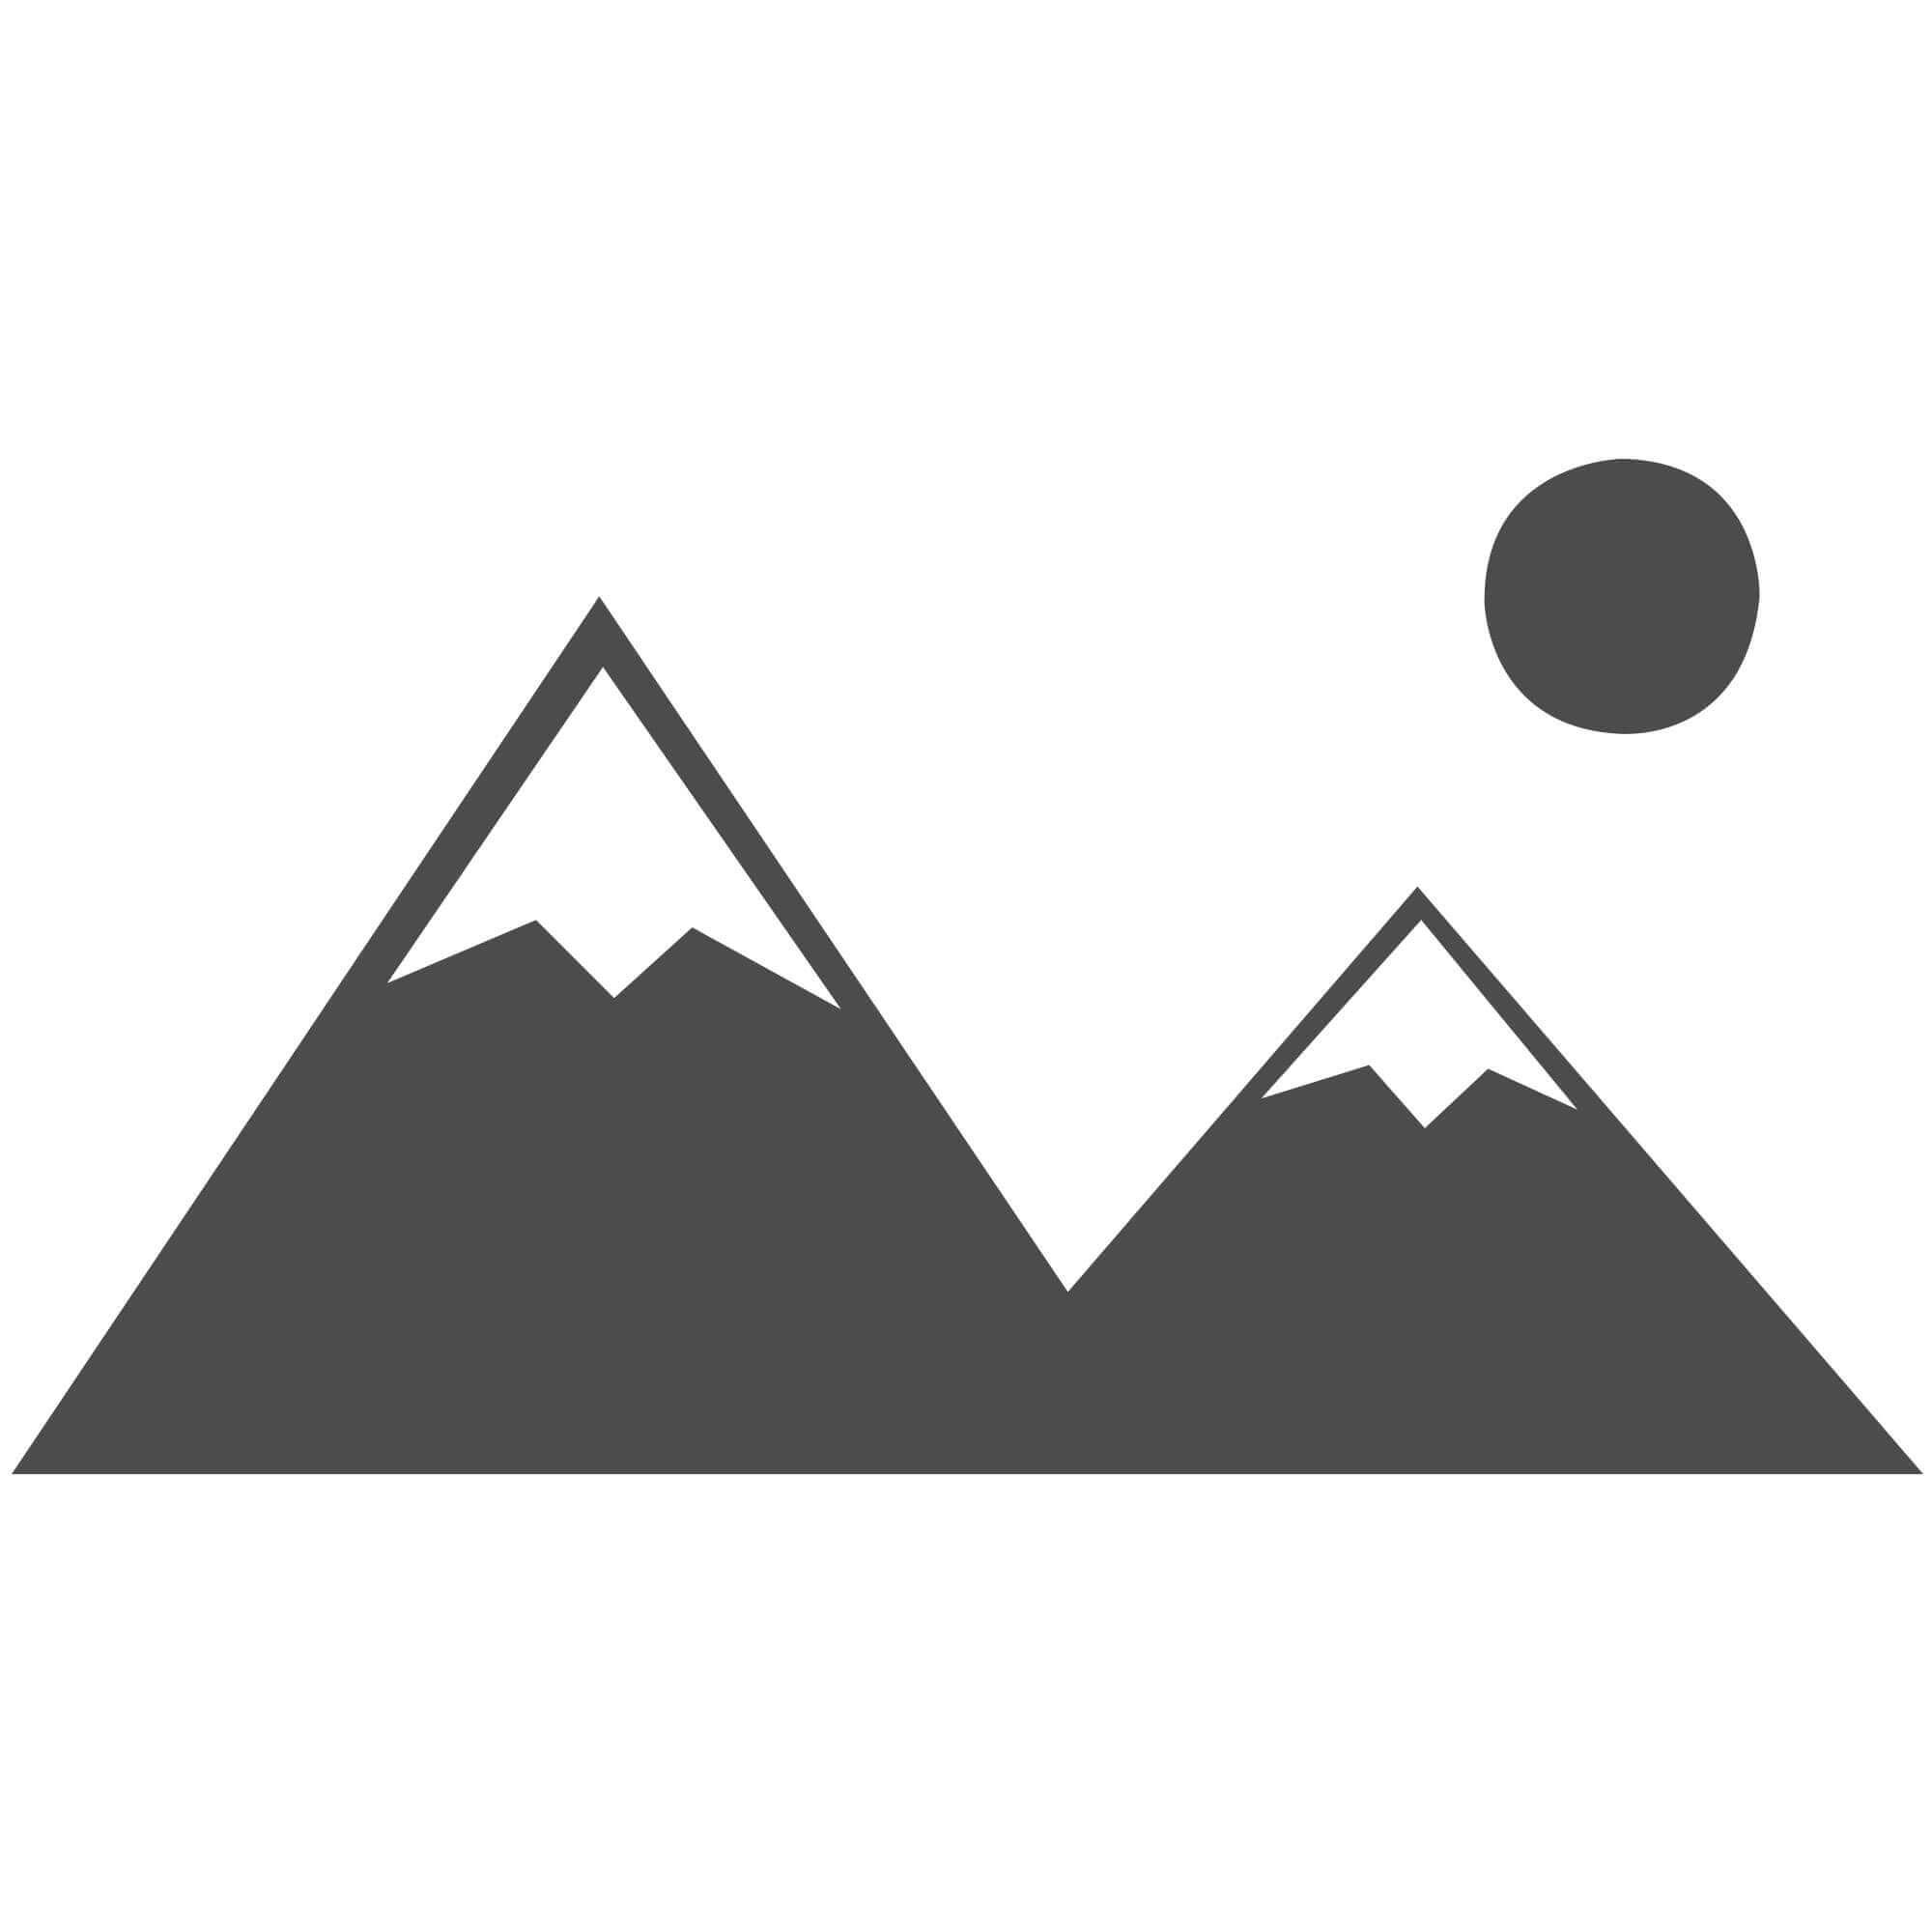 Royal Classic Traditional Bokhara Design Red Rug - 537 R-120 x 180 cm (4' x 6')